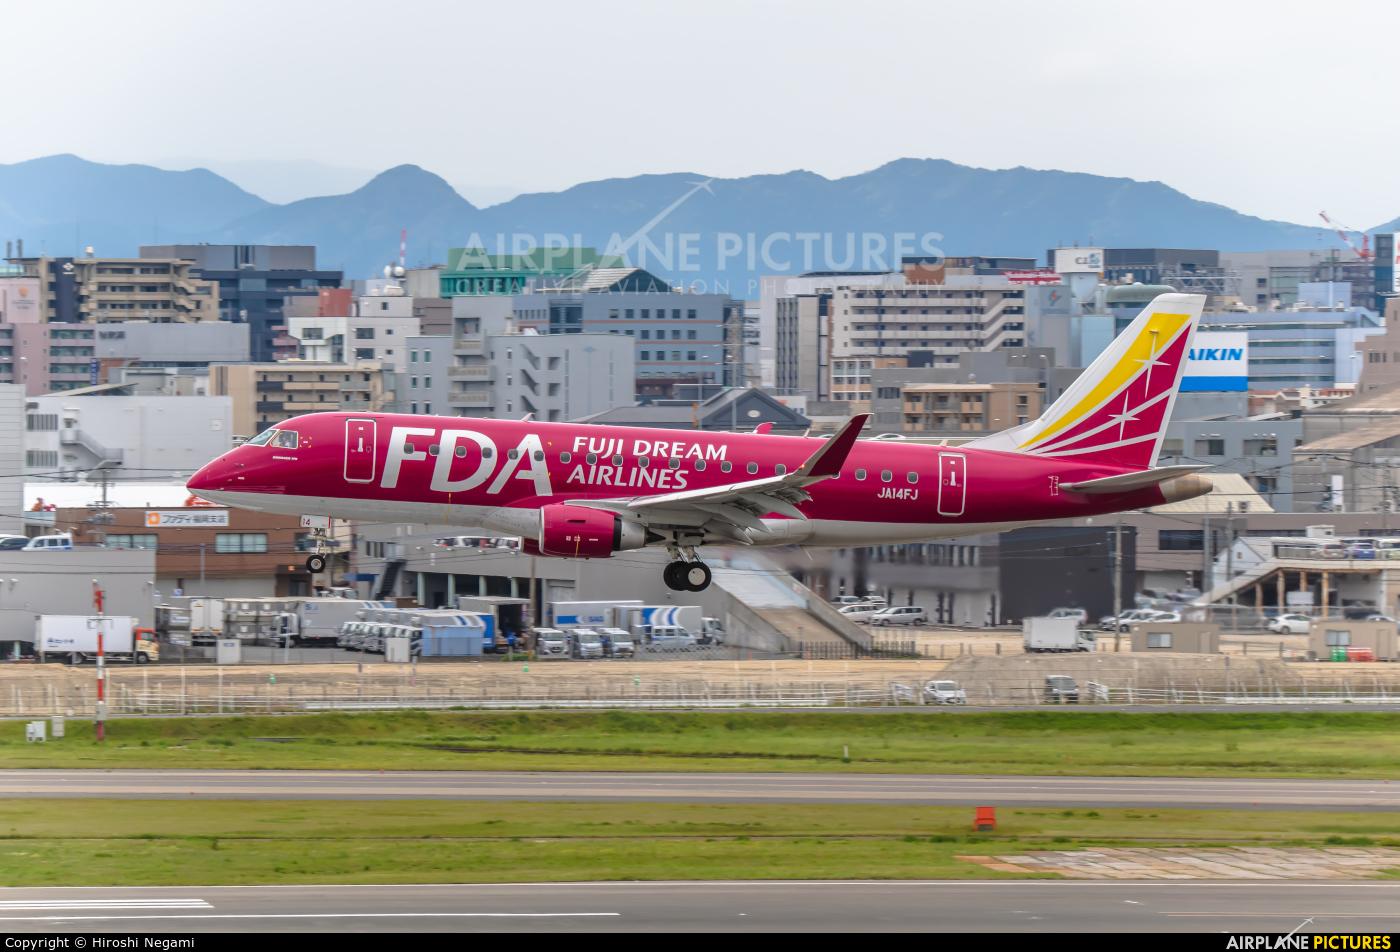 Fuji Dream Airlines JA14FJ aircraft at Fukuoka